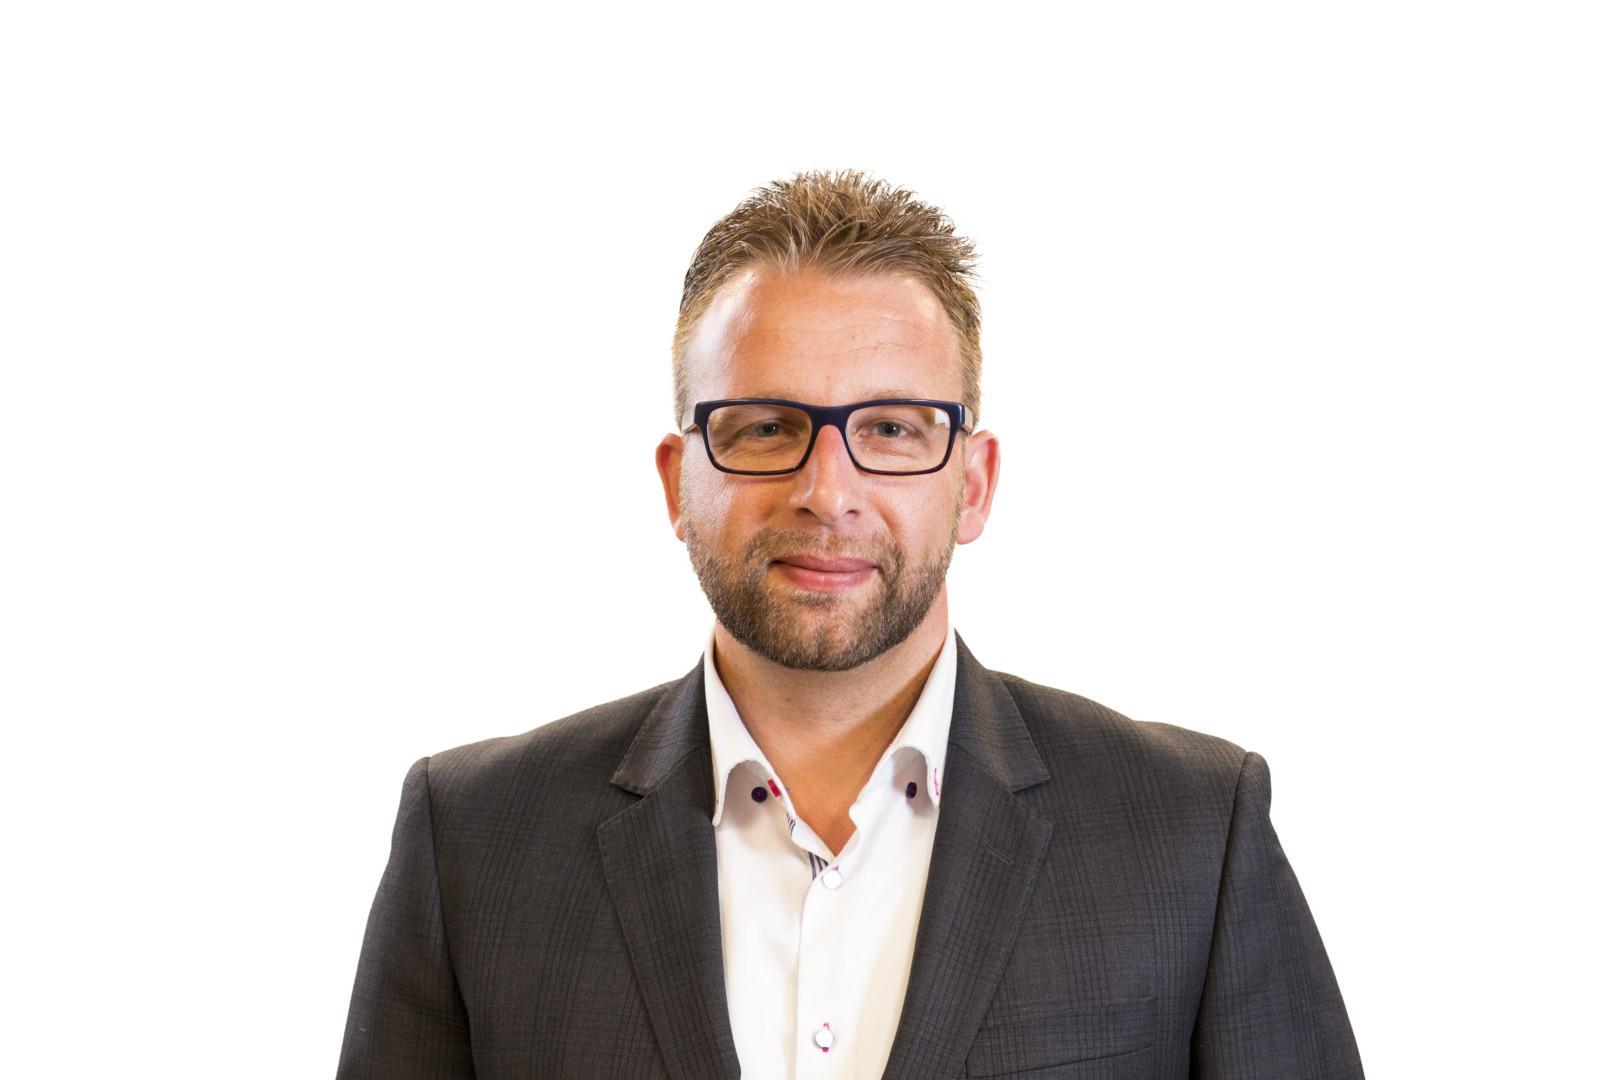 Janno Brinkhuis